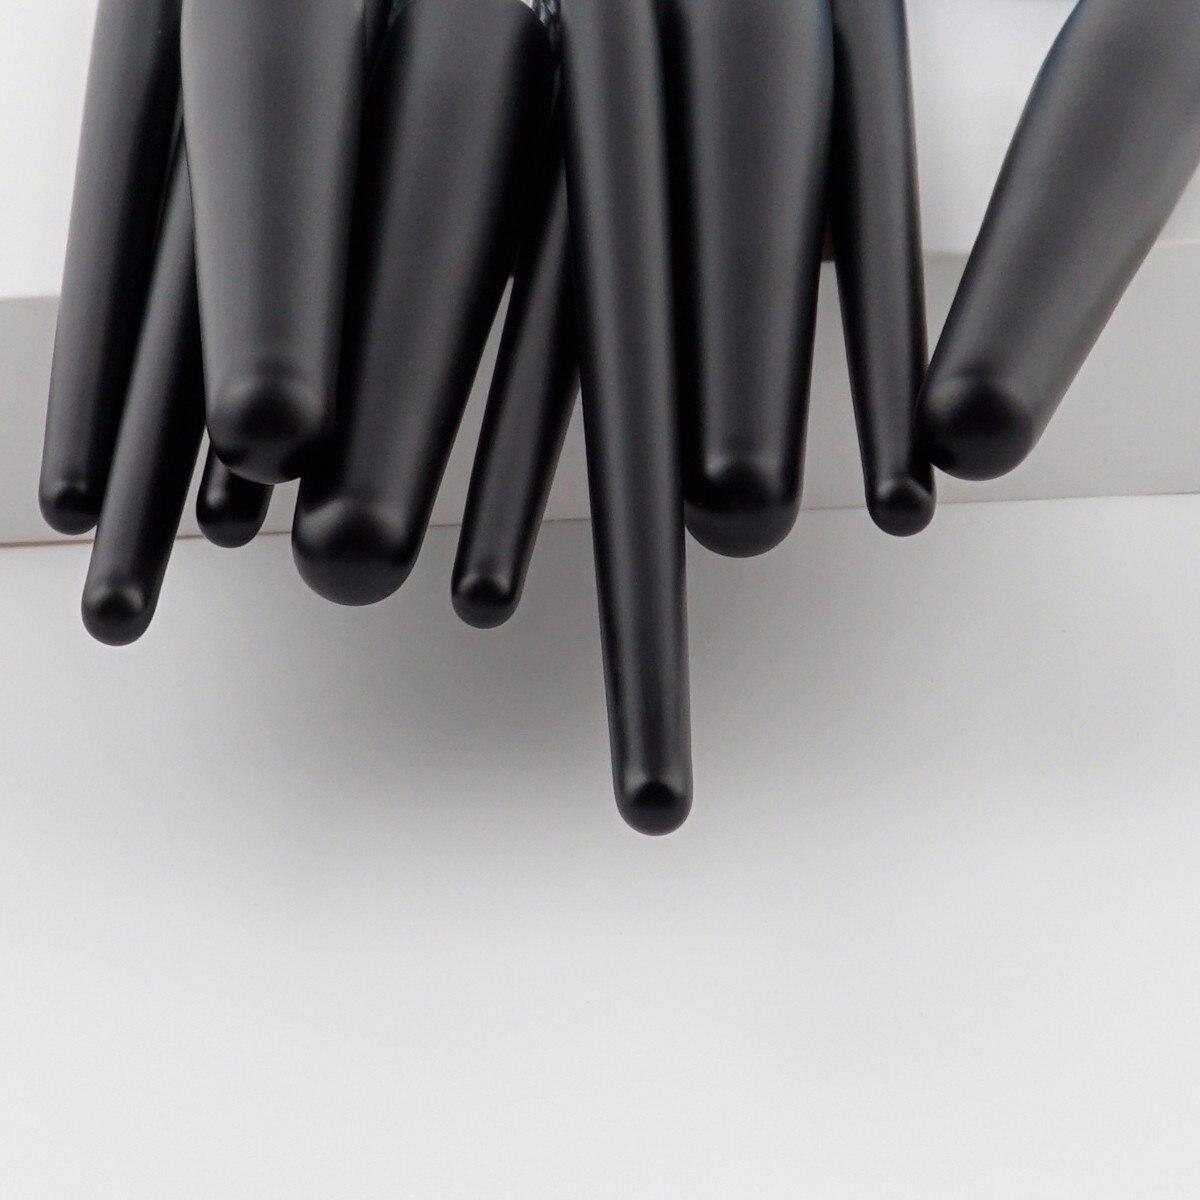 eye shadow blending contour highlight cosmetic beauty make up brush tool kits 05